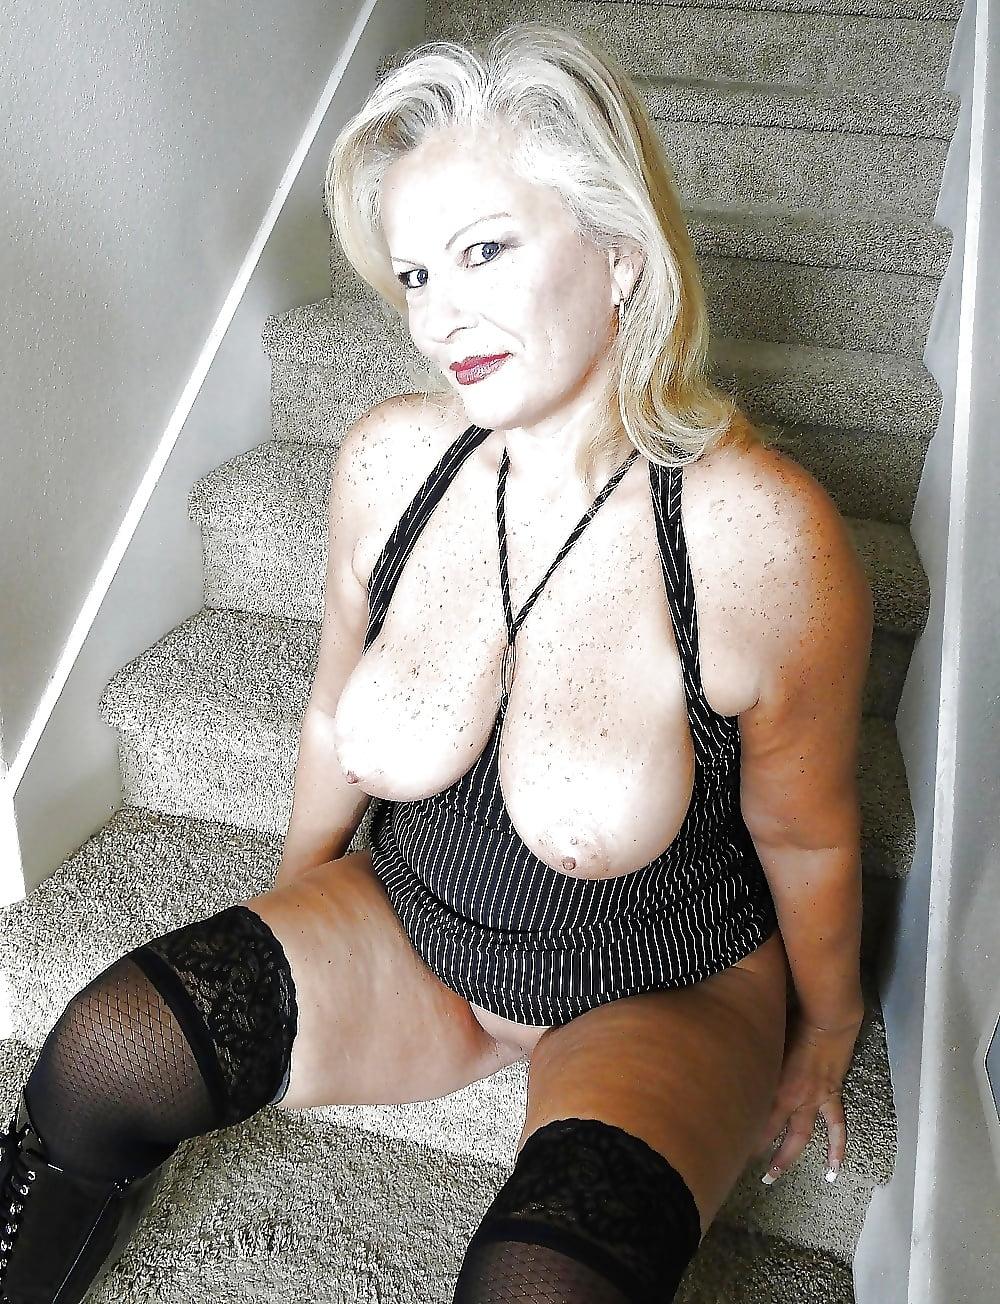 Daniella english milf on my wet erotic images full hd